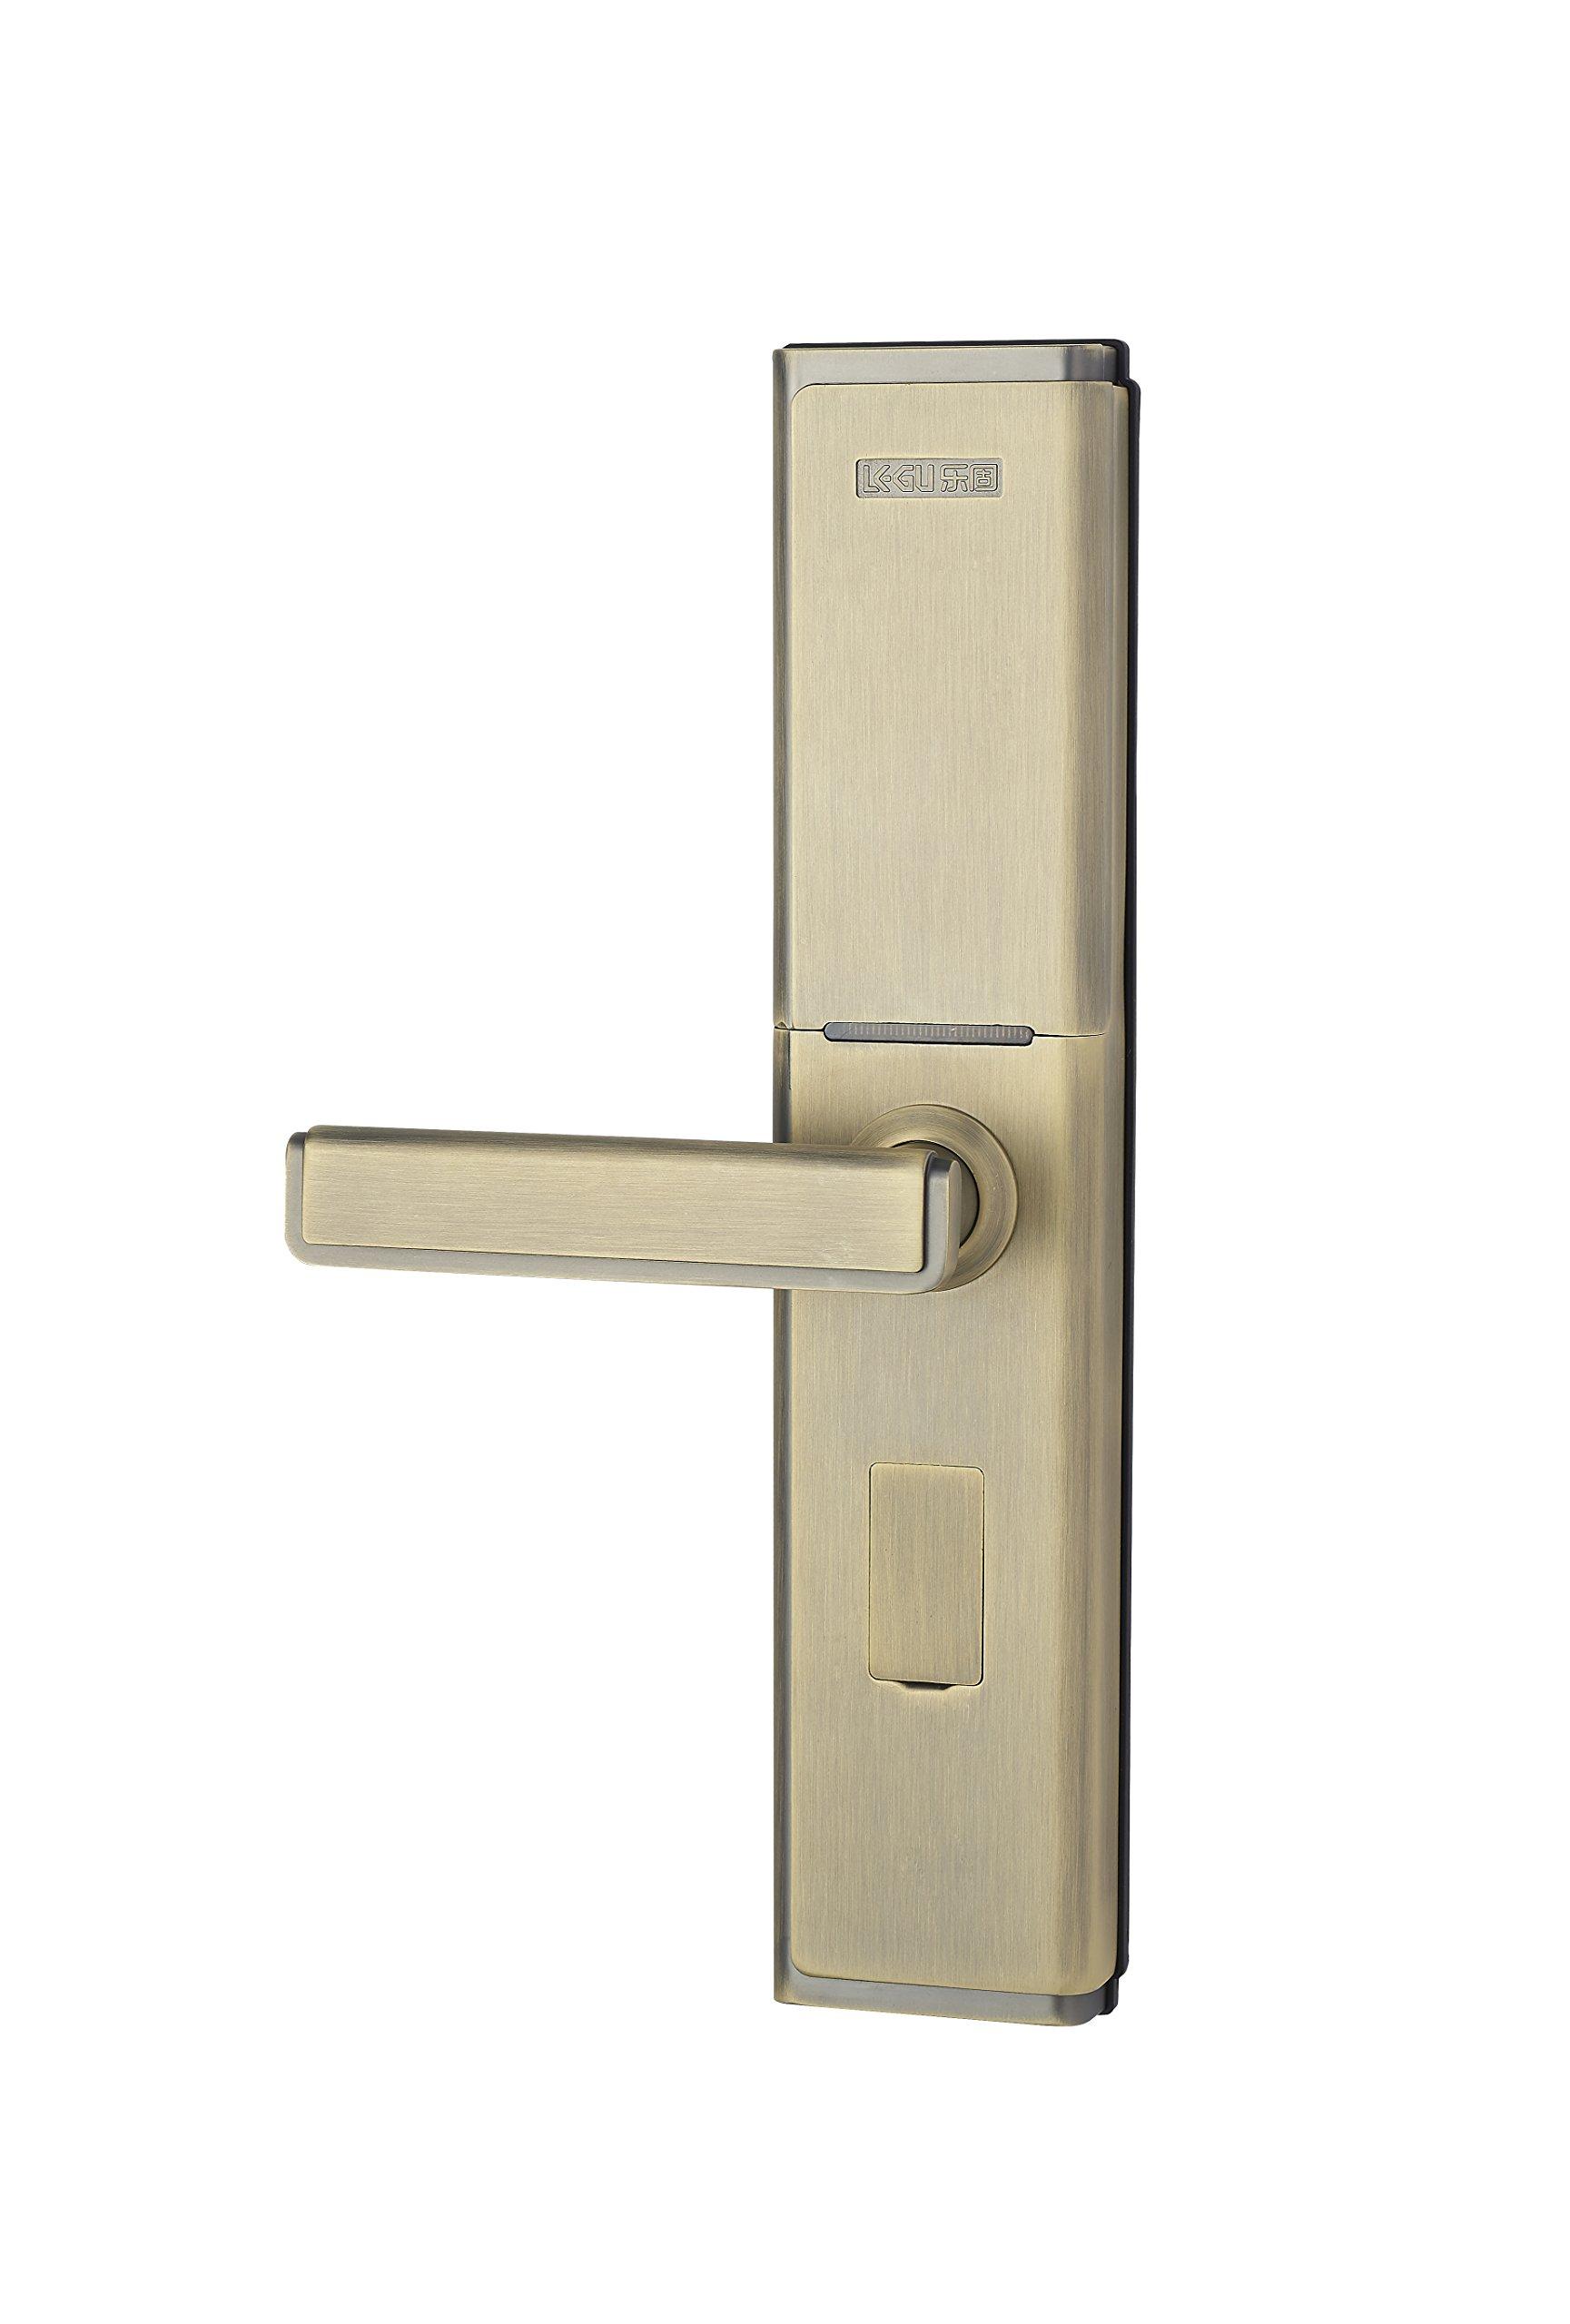 LEGU Fingerprint and Touchscreen Keyless Smart Lever Lock for Door fingerprint+password+card+key/Security intelligent anti-theft lock (Left handed) by LEGU (Image #1)